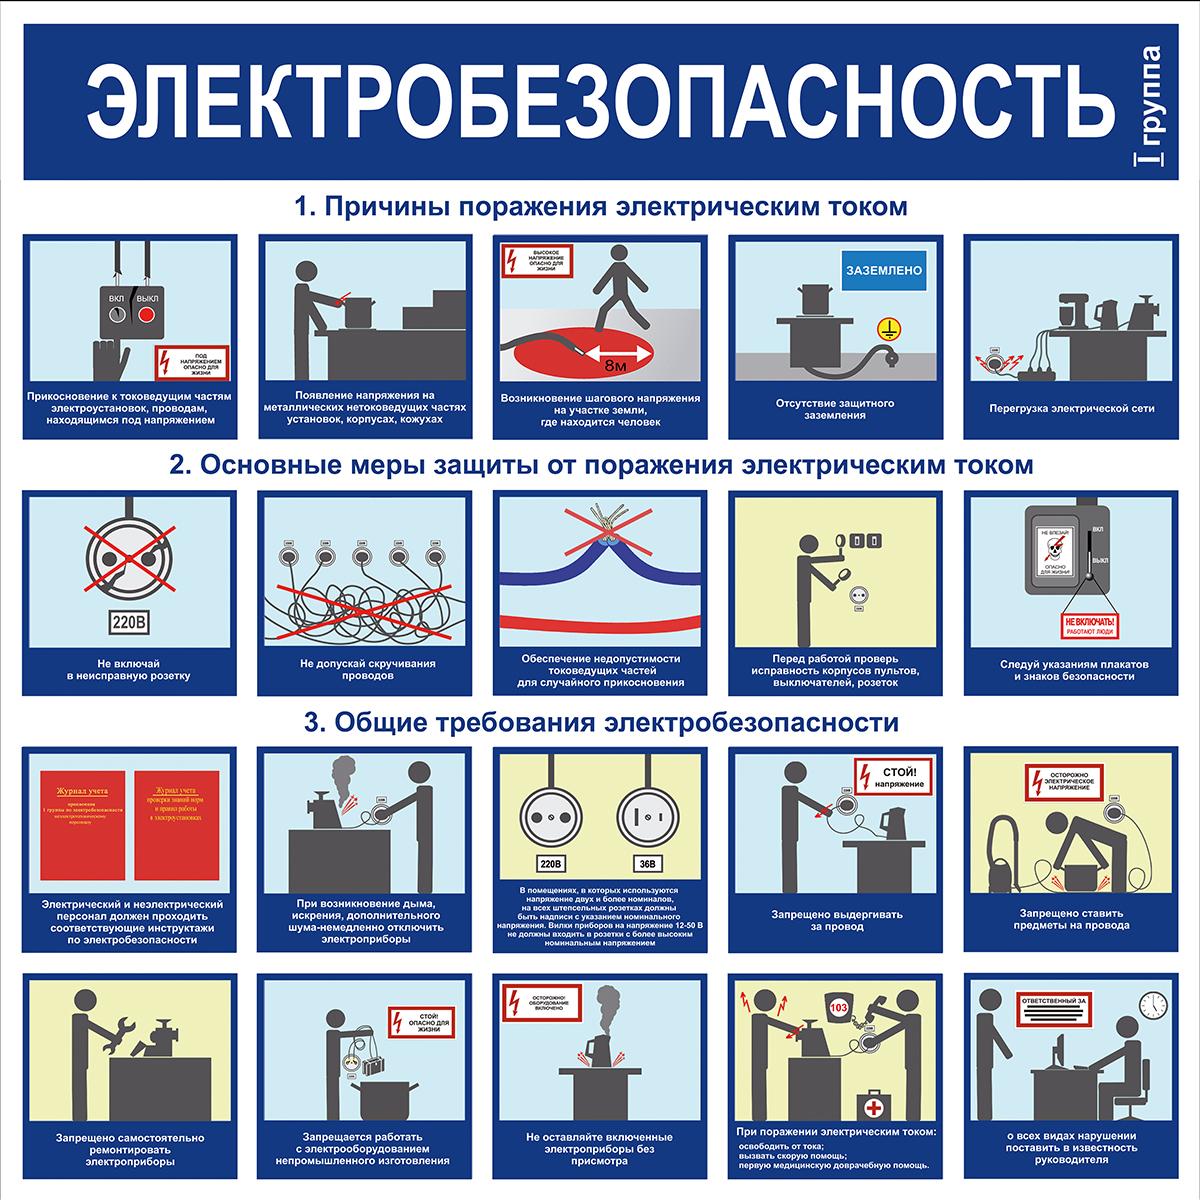 Инструкции 1 группе электробезопасности